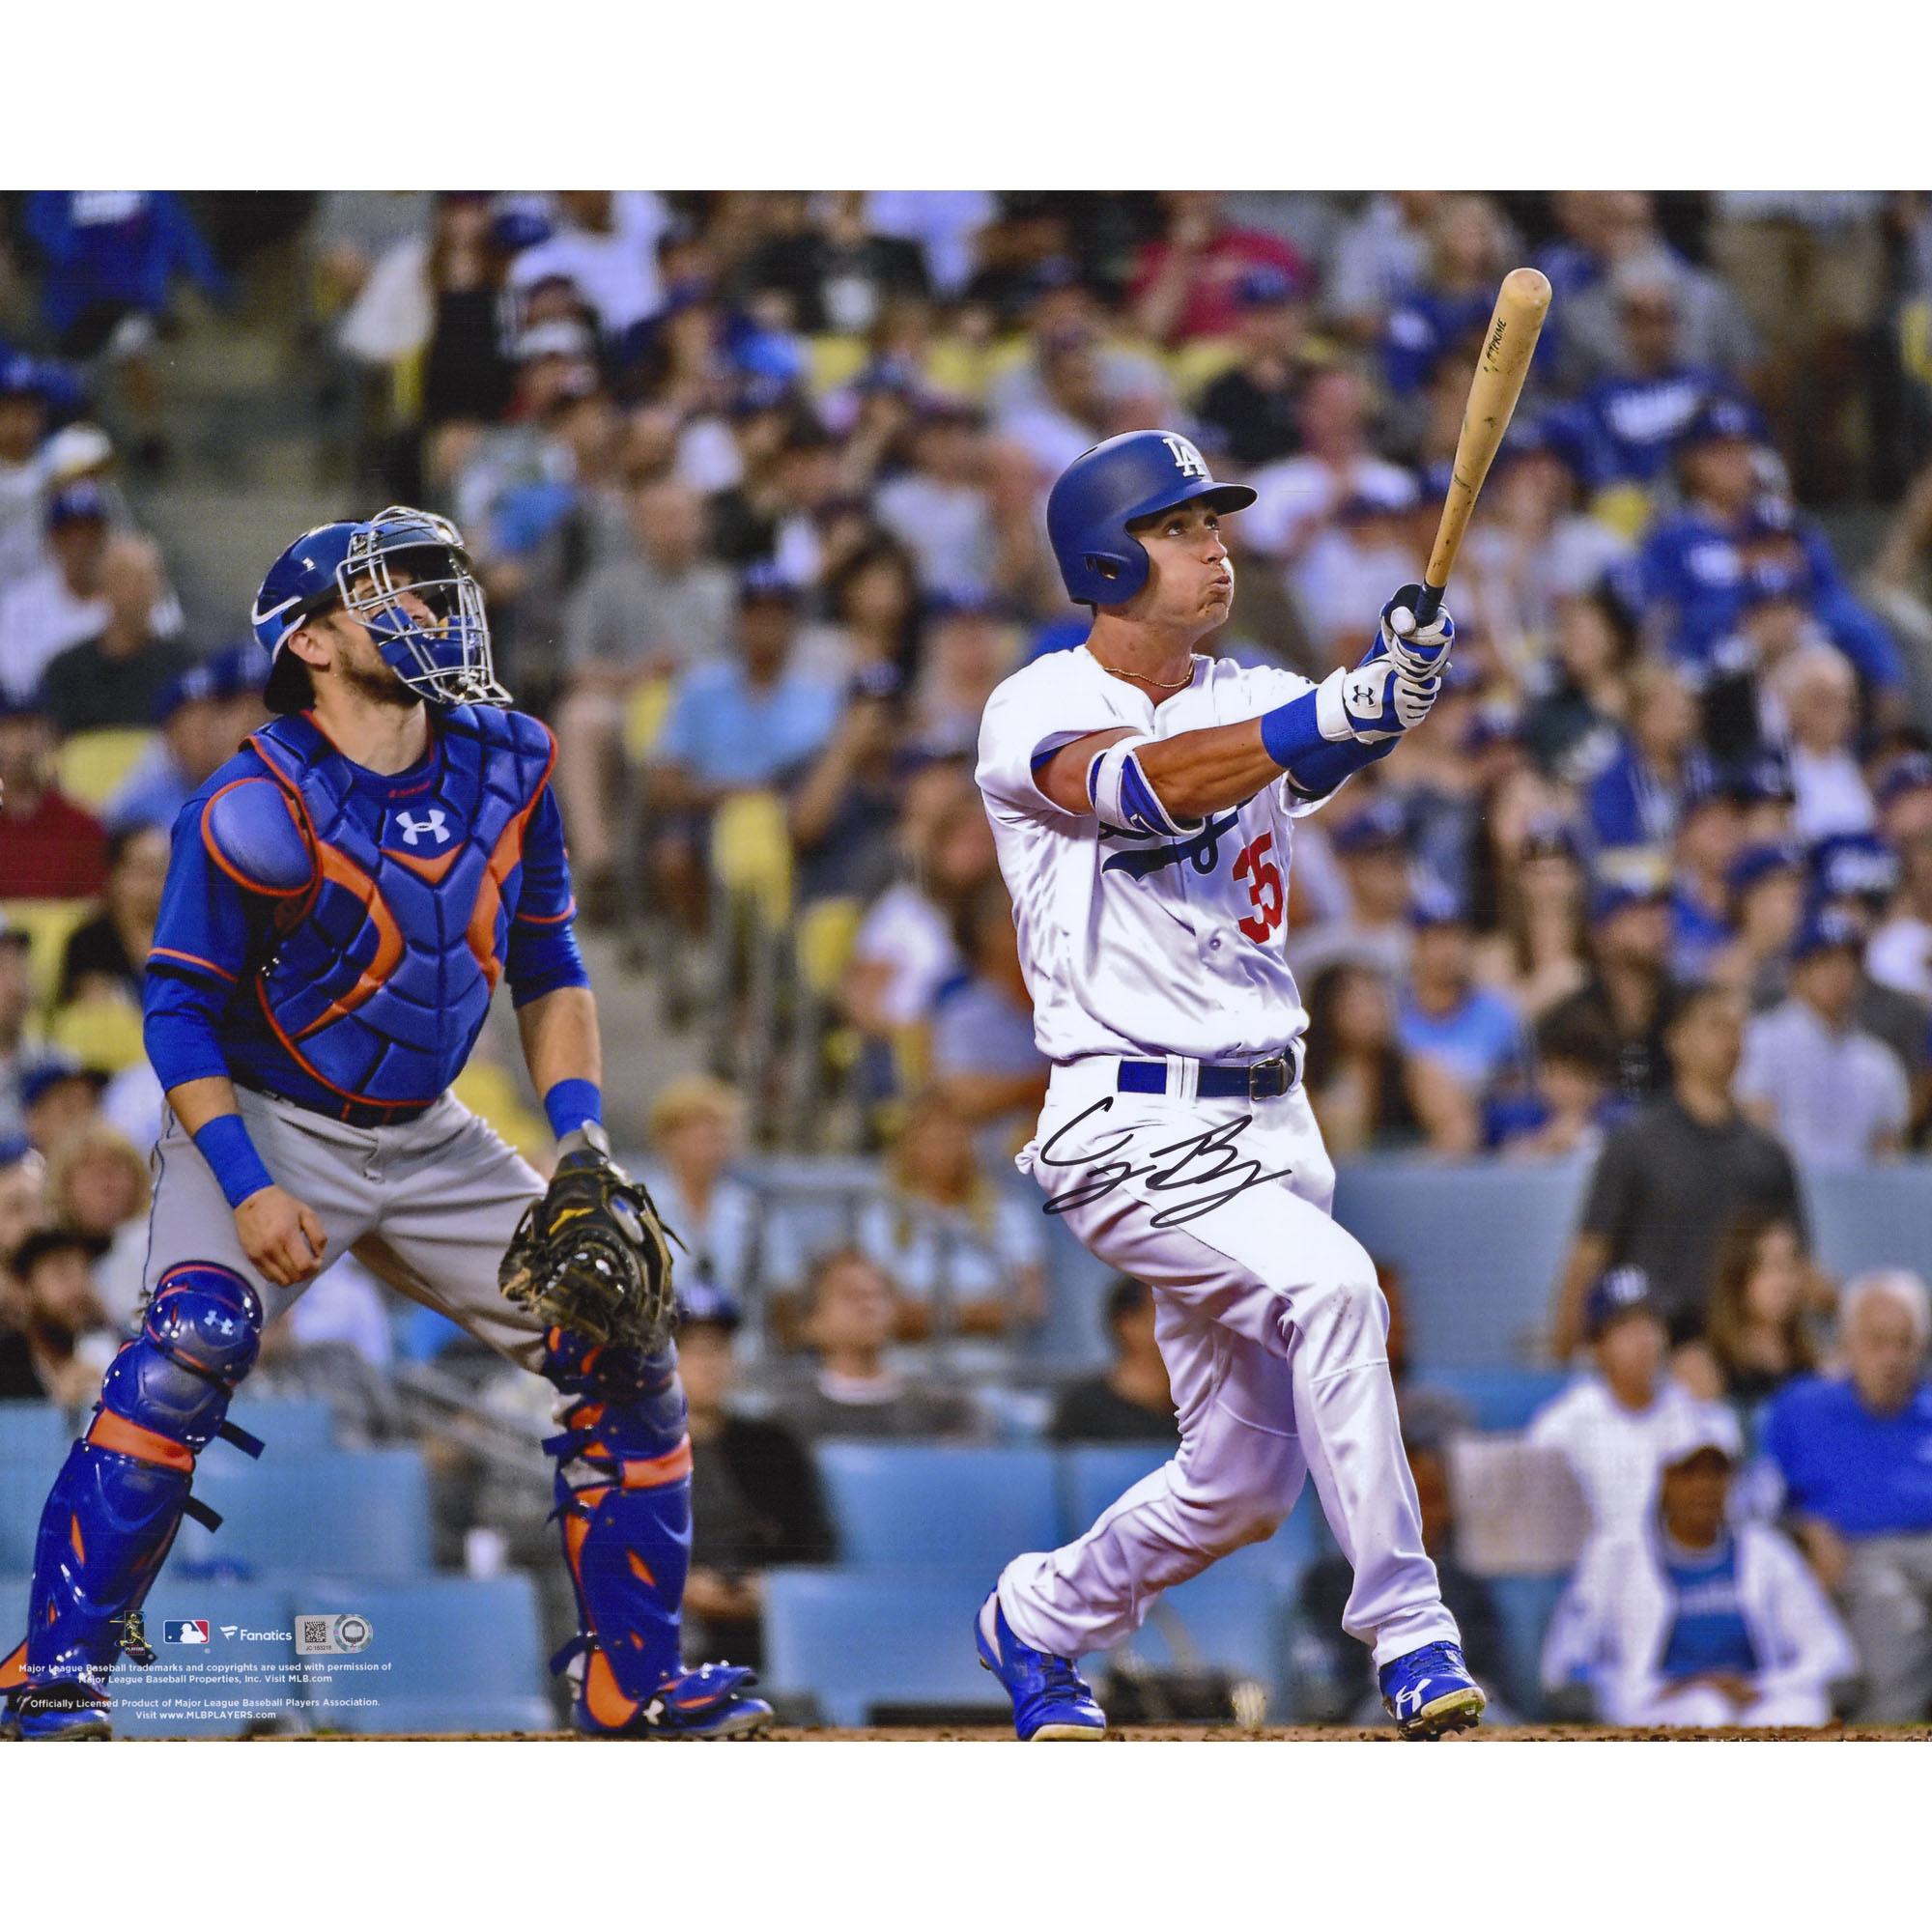 "Cody Bellinger Los Angeles Dodgers Fanatics Authentic Autographed 16"" x 20"" Hitting Home Run Photograph - No Size"